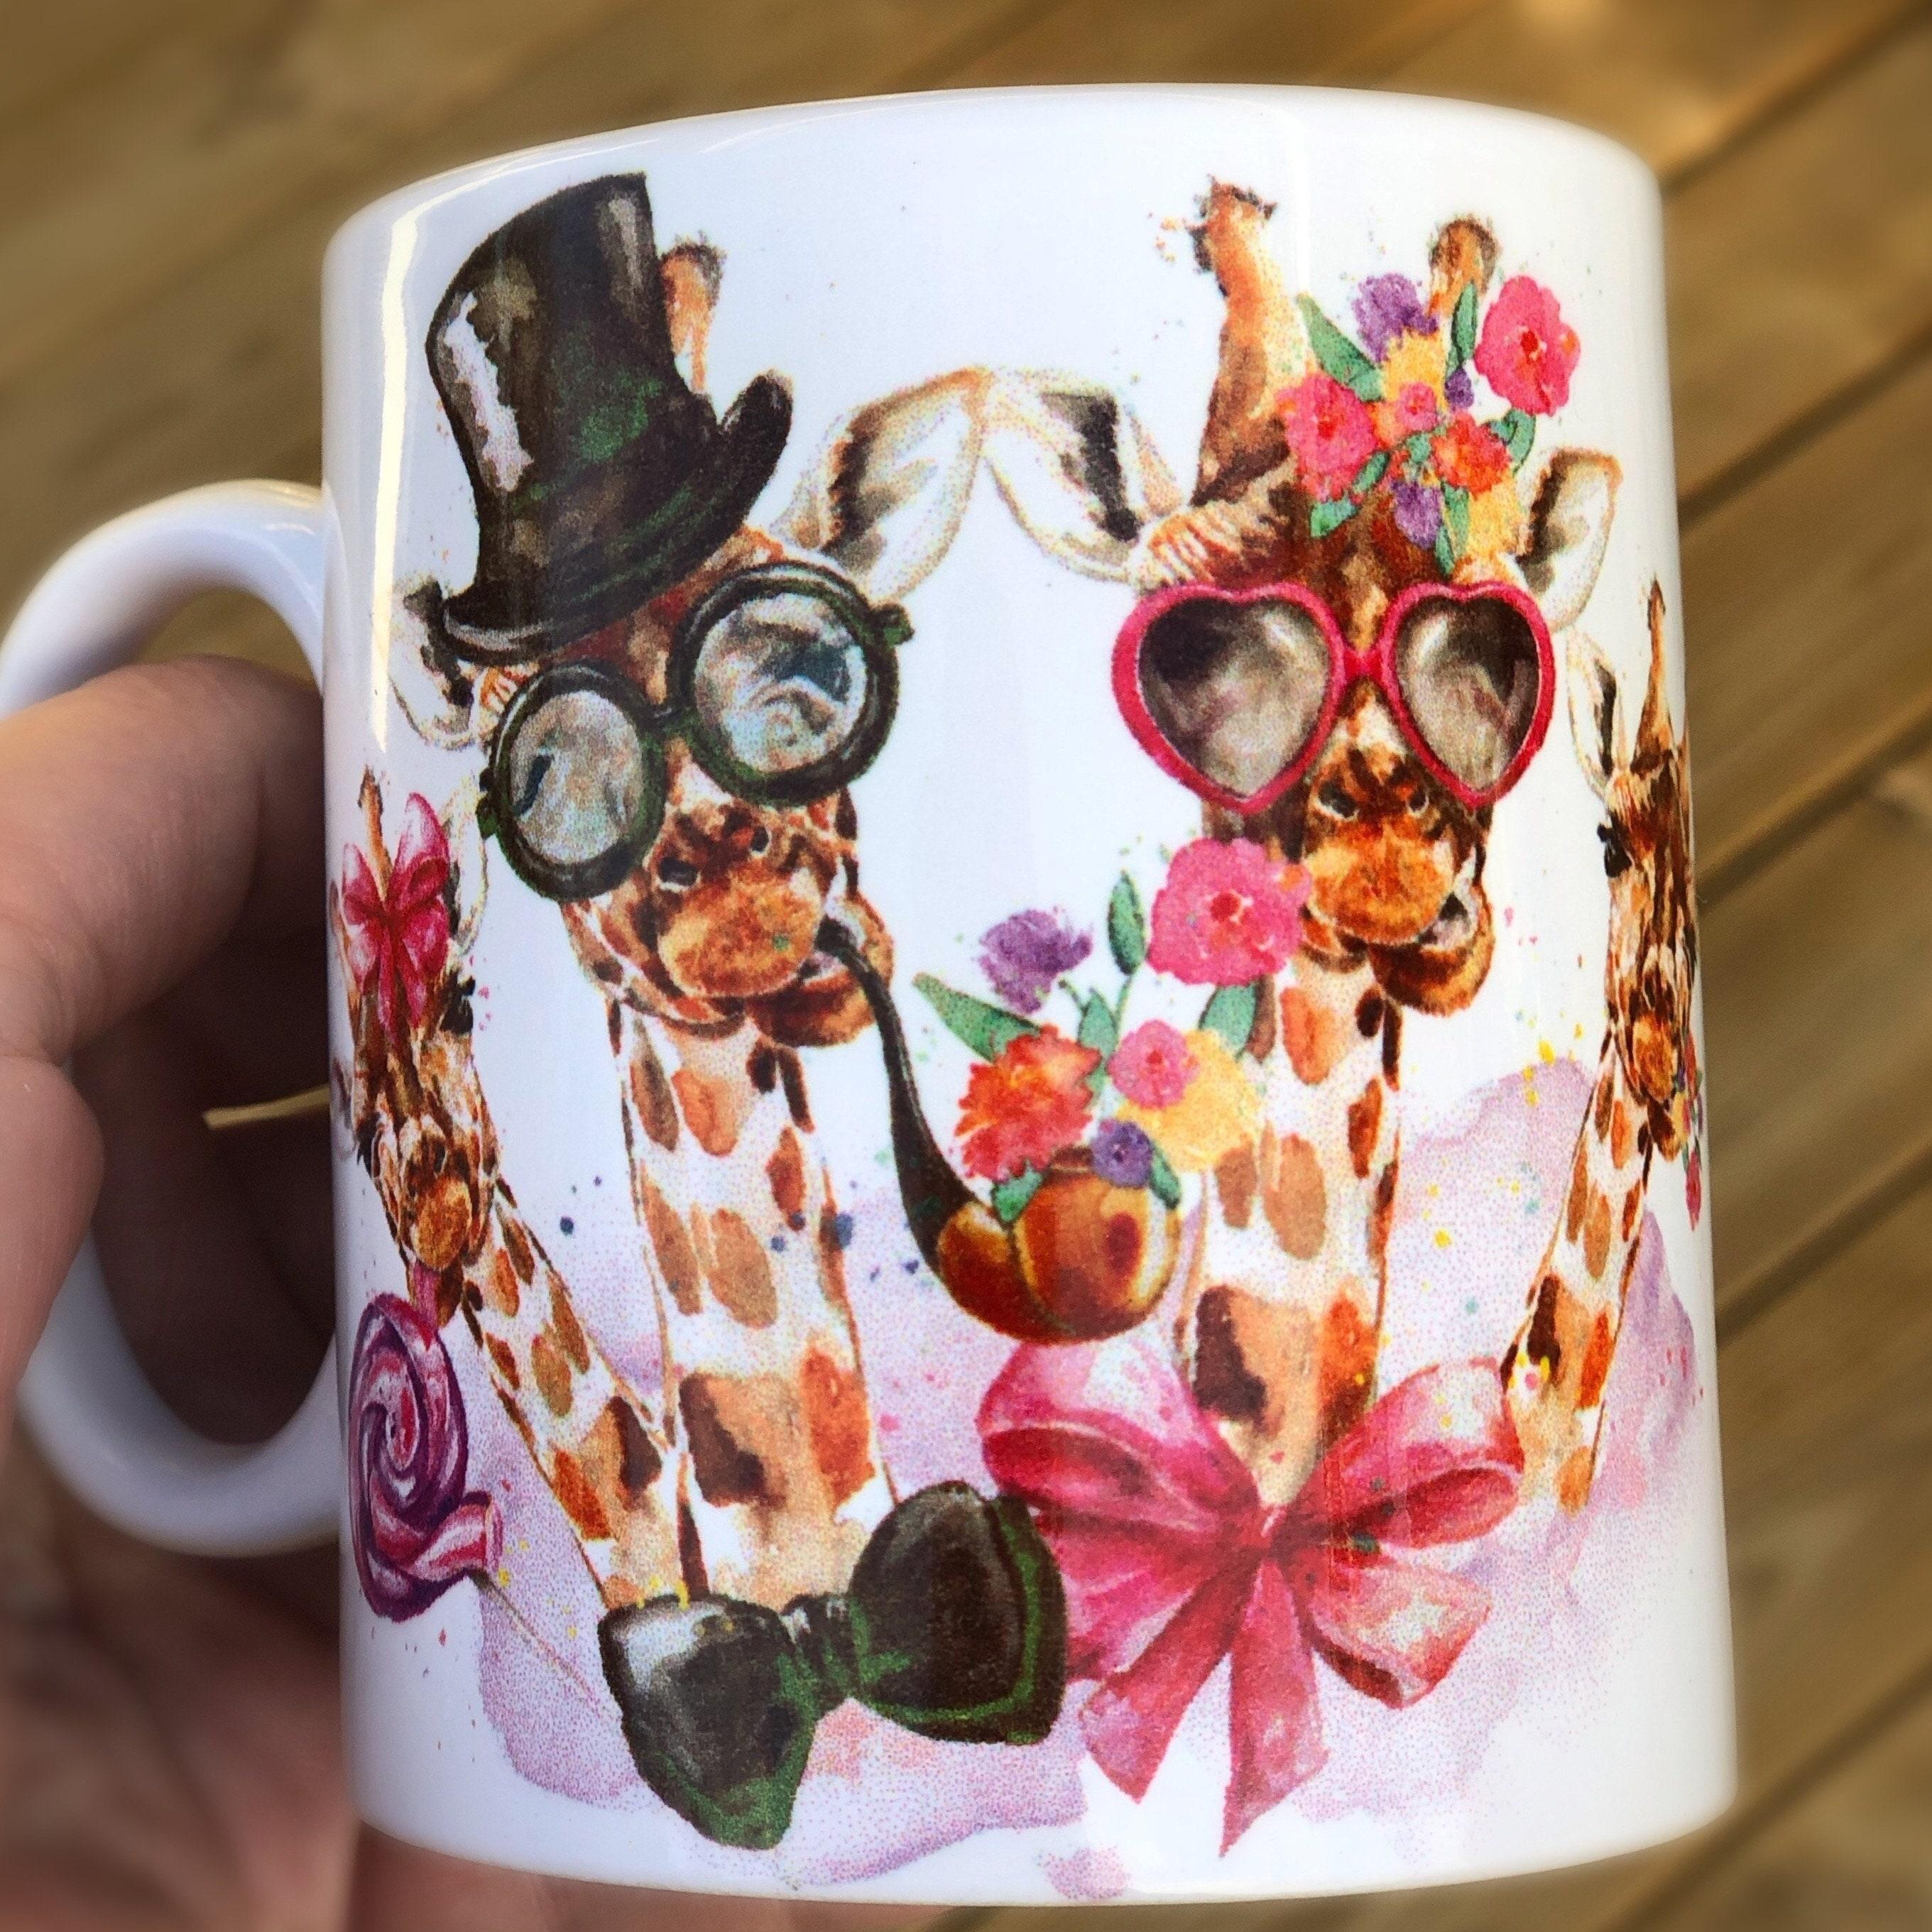 8aa82cf38d4 Giraffe Personalized Mug - gift - Mug - coffeecup - Quote - Cups - Your  text - your name - animal - giraff -family